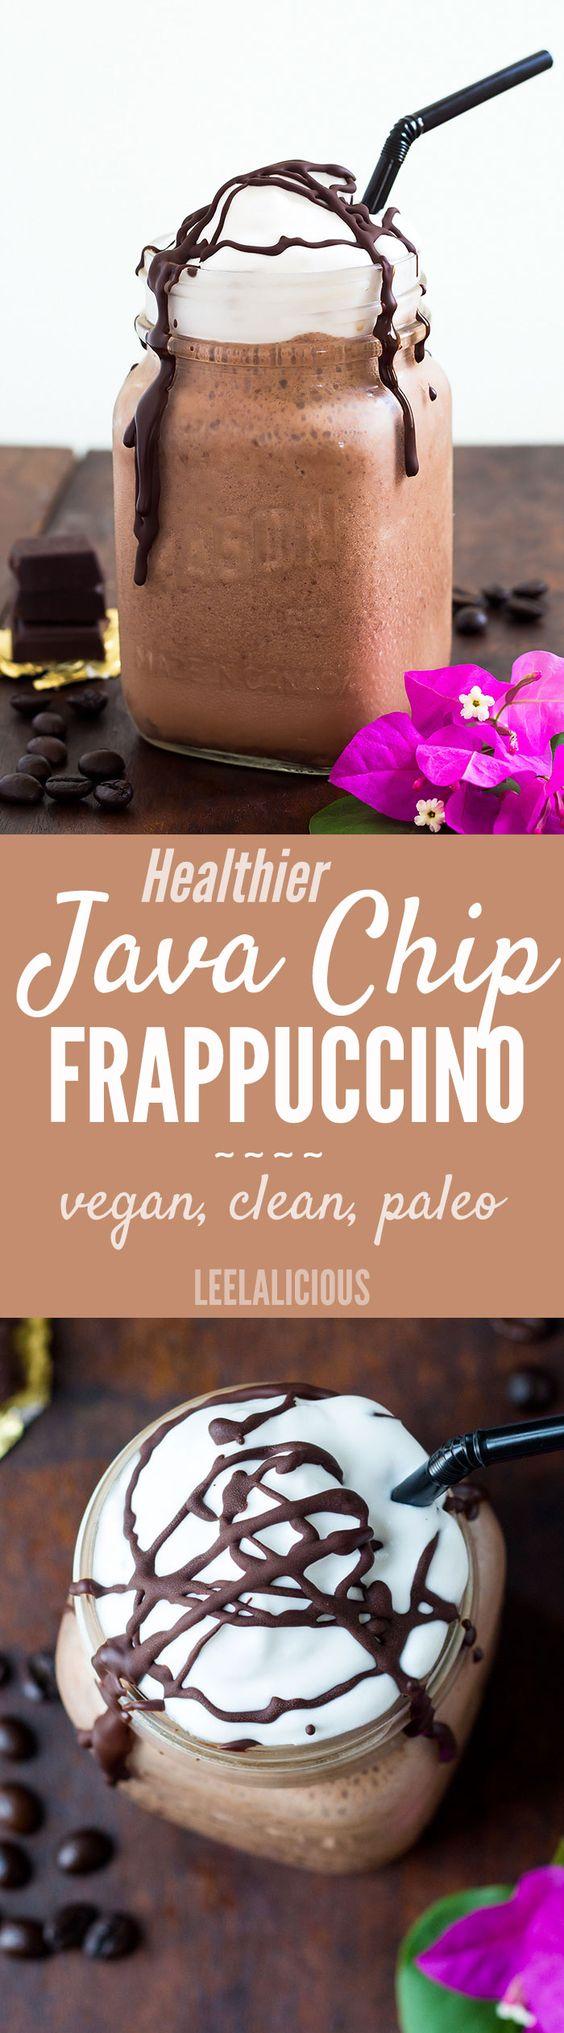 java chip frappuccino - paleo, vegan, gluten free